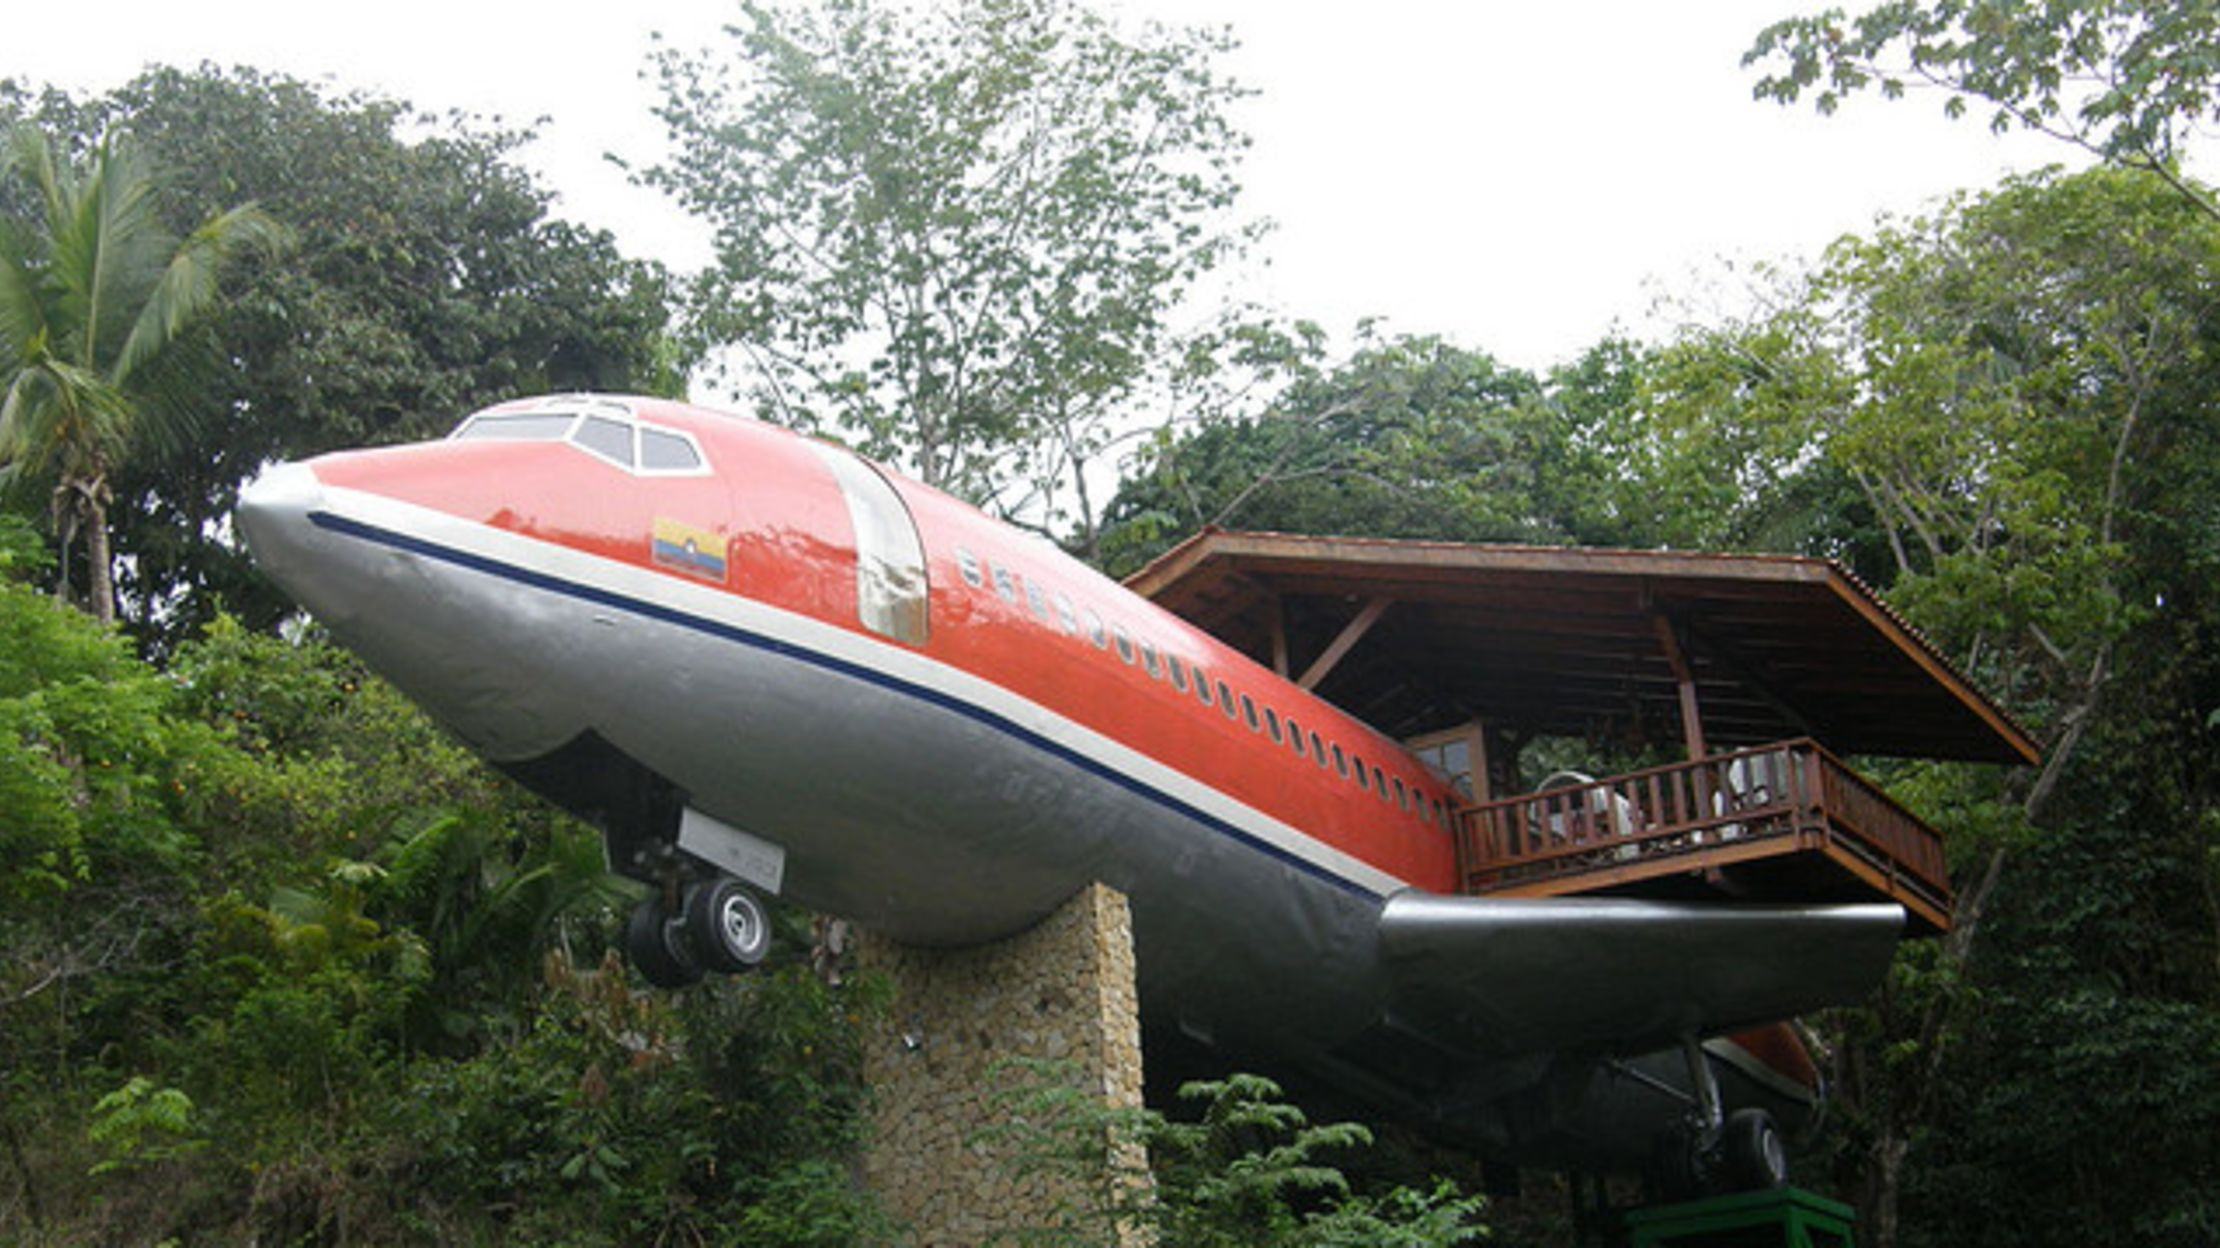 Original Boeing 727 prepares for its final takeoff